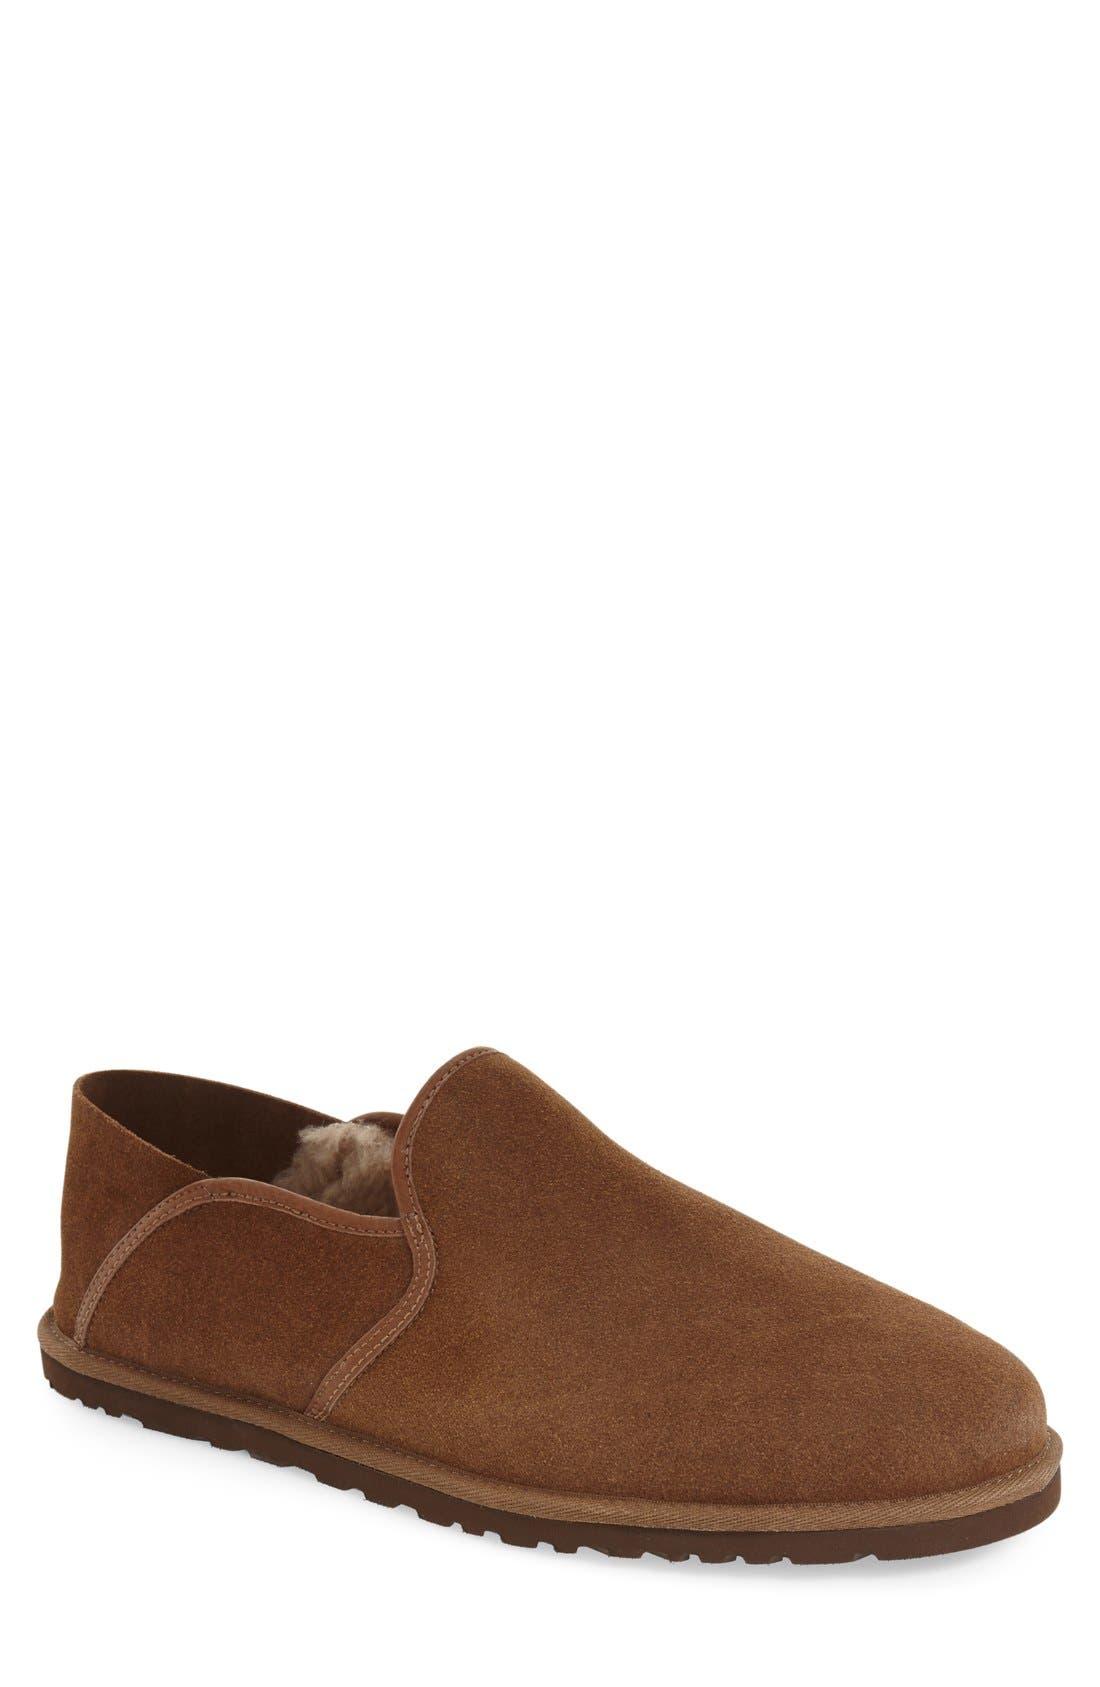 Ugg Cooke Slipper, 8- Brown